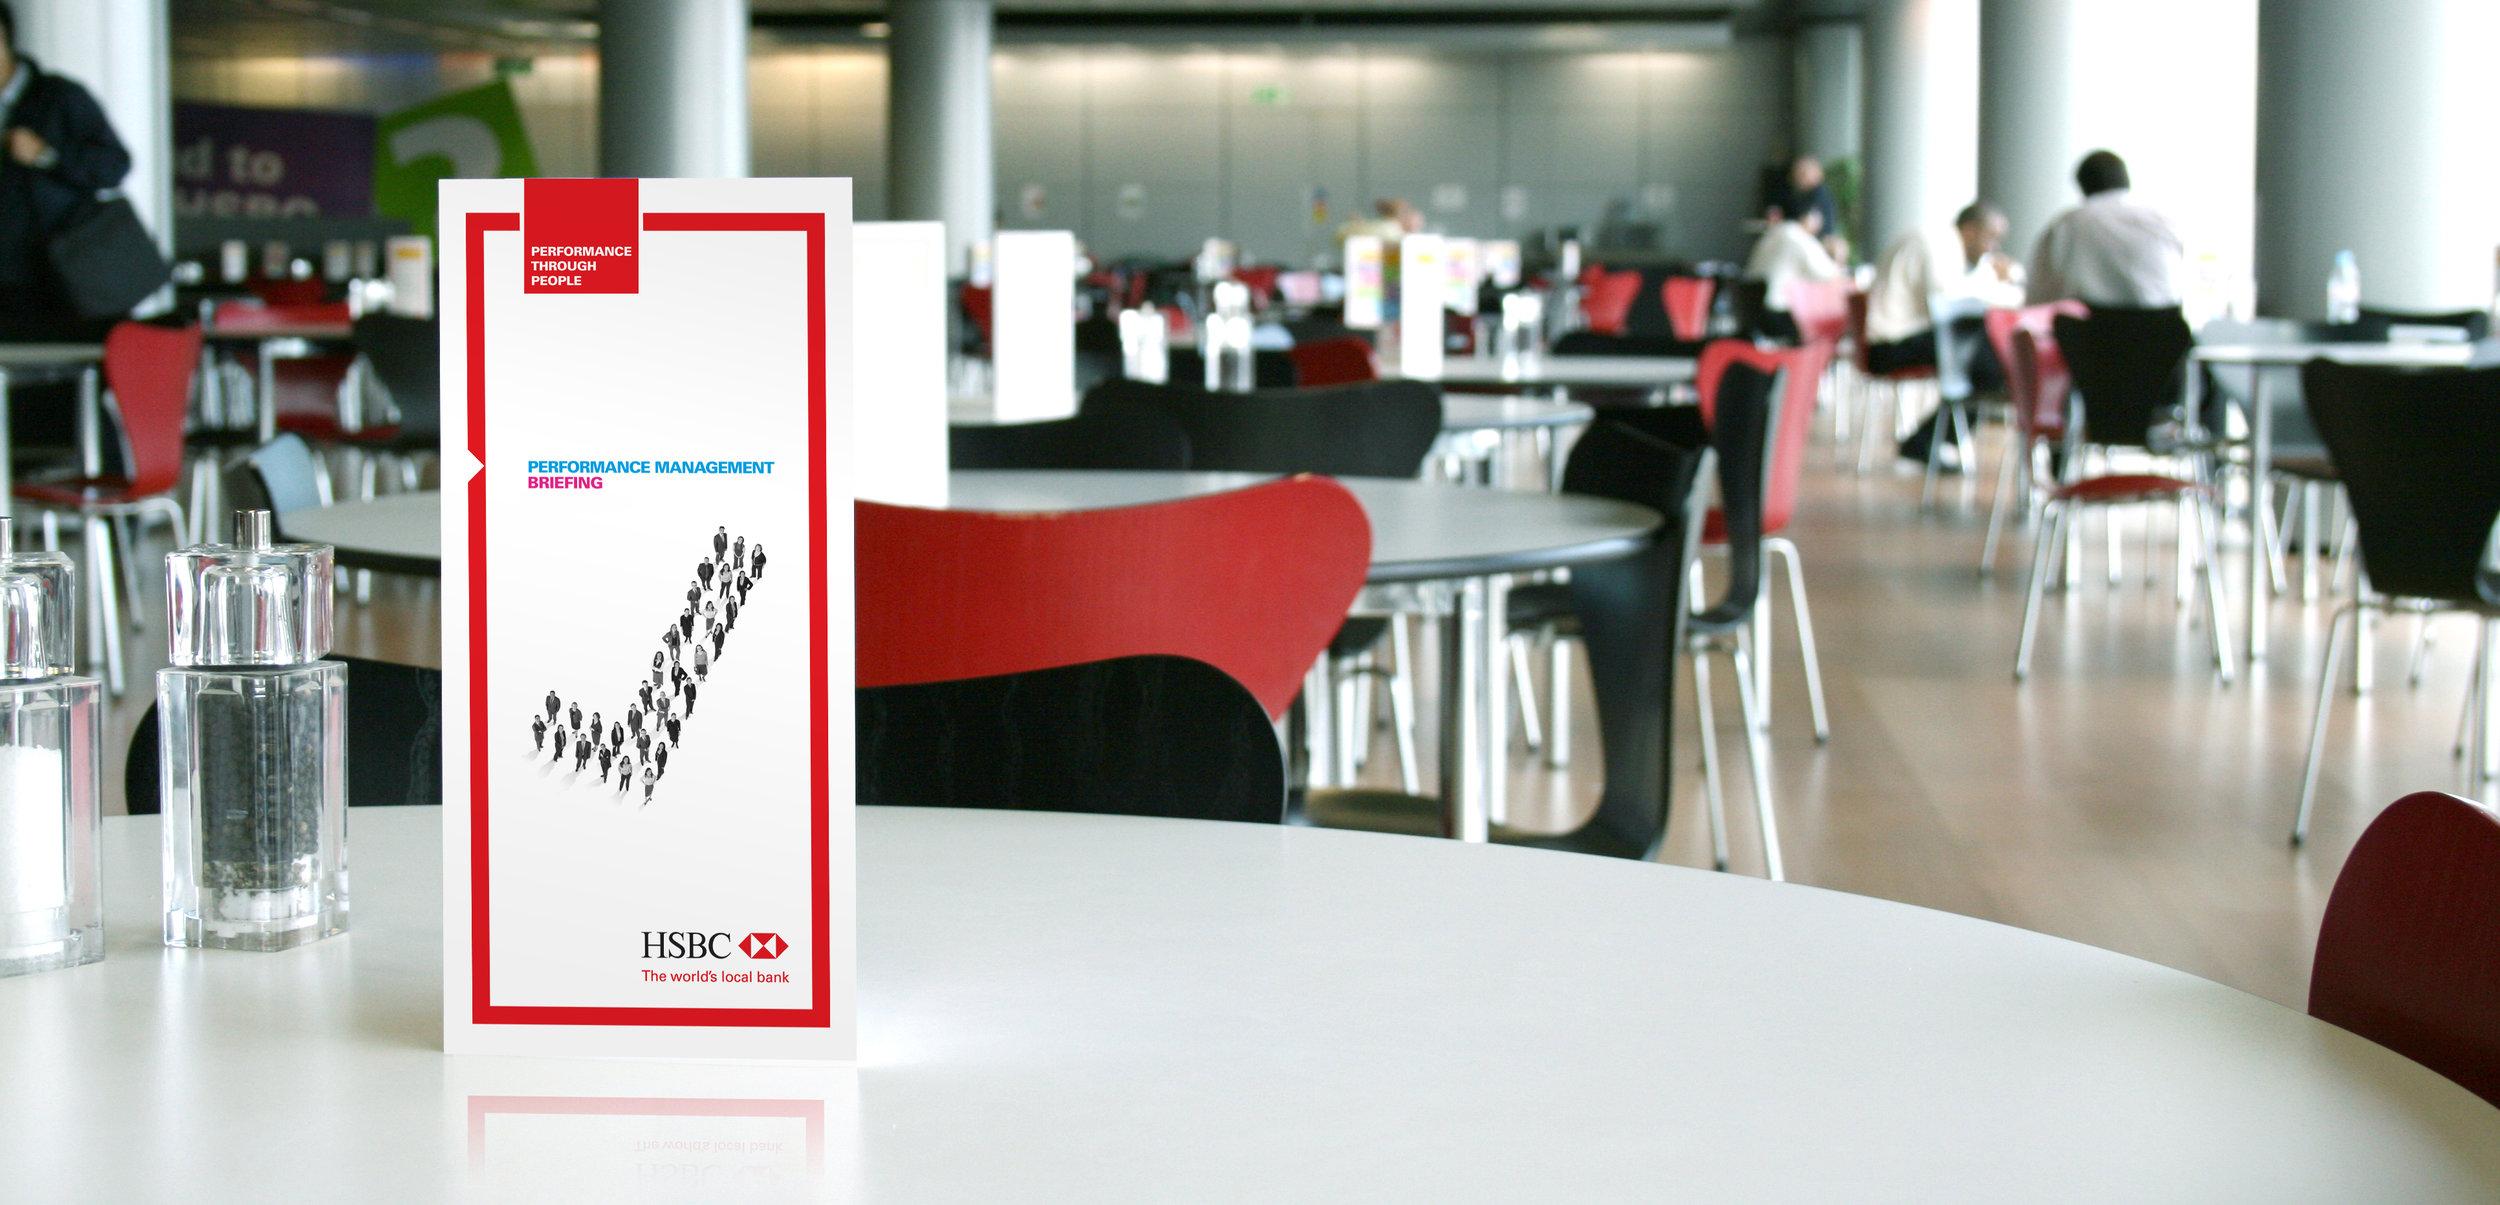 HSBC_tentcard_transformation copy copy.jpg